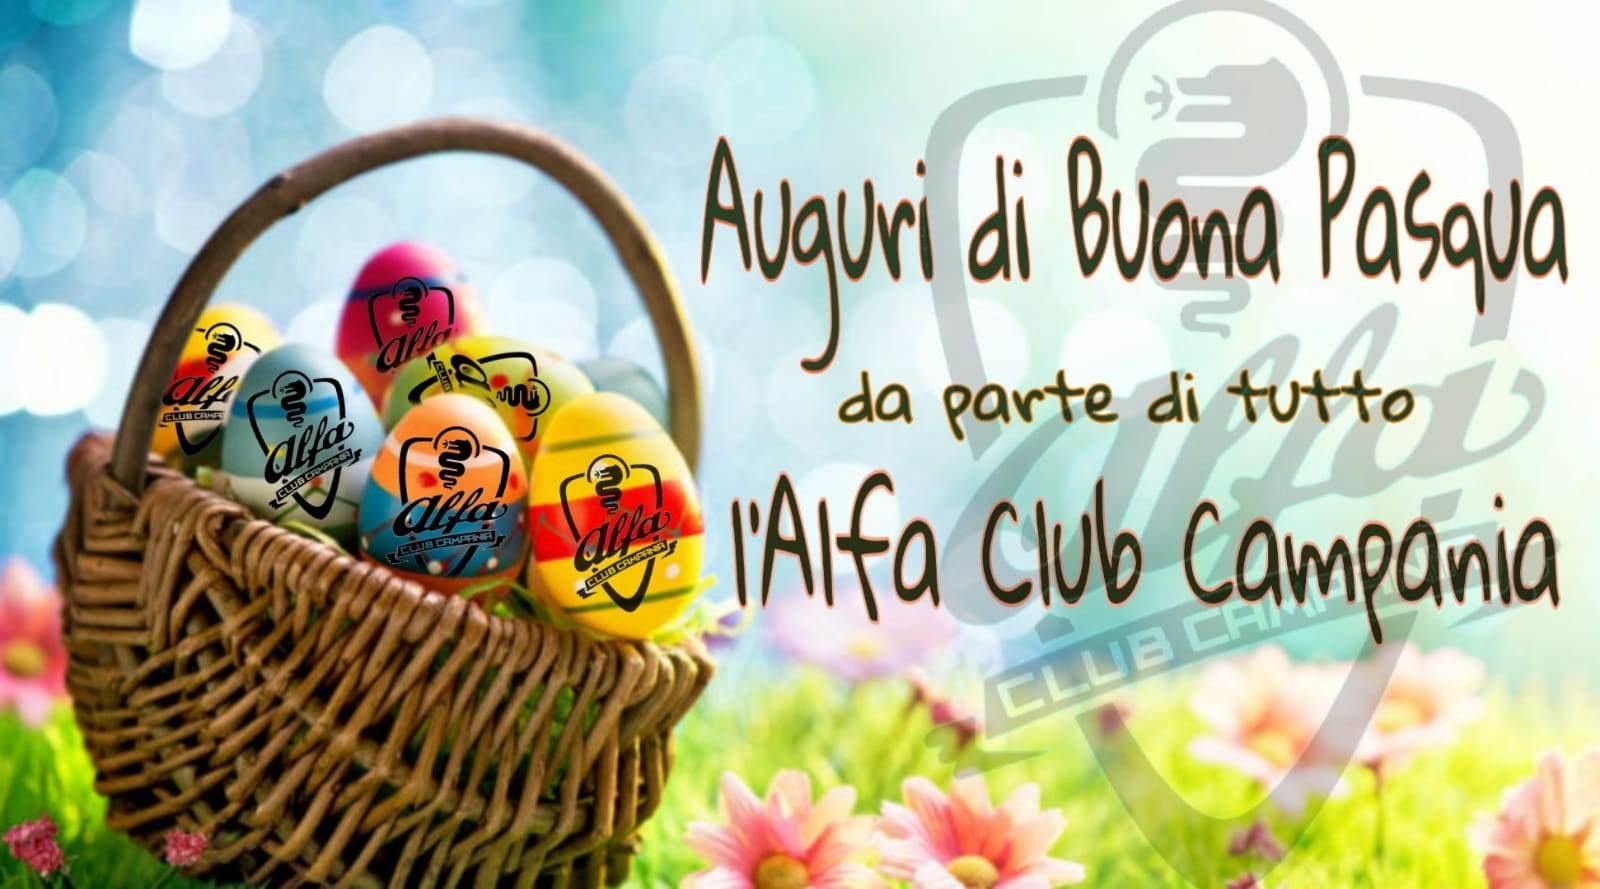 foto Alfa Club Campania - 26